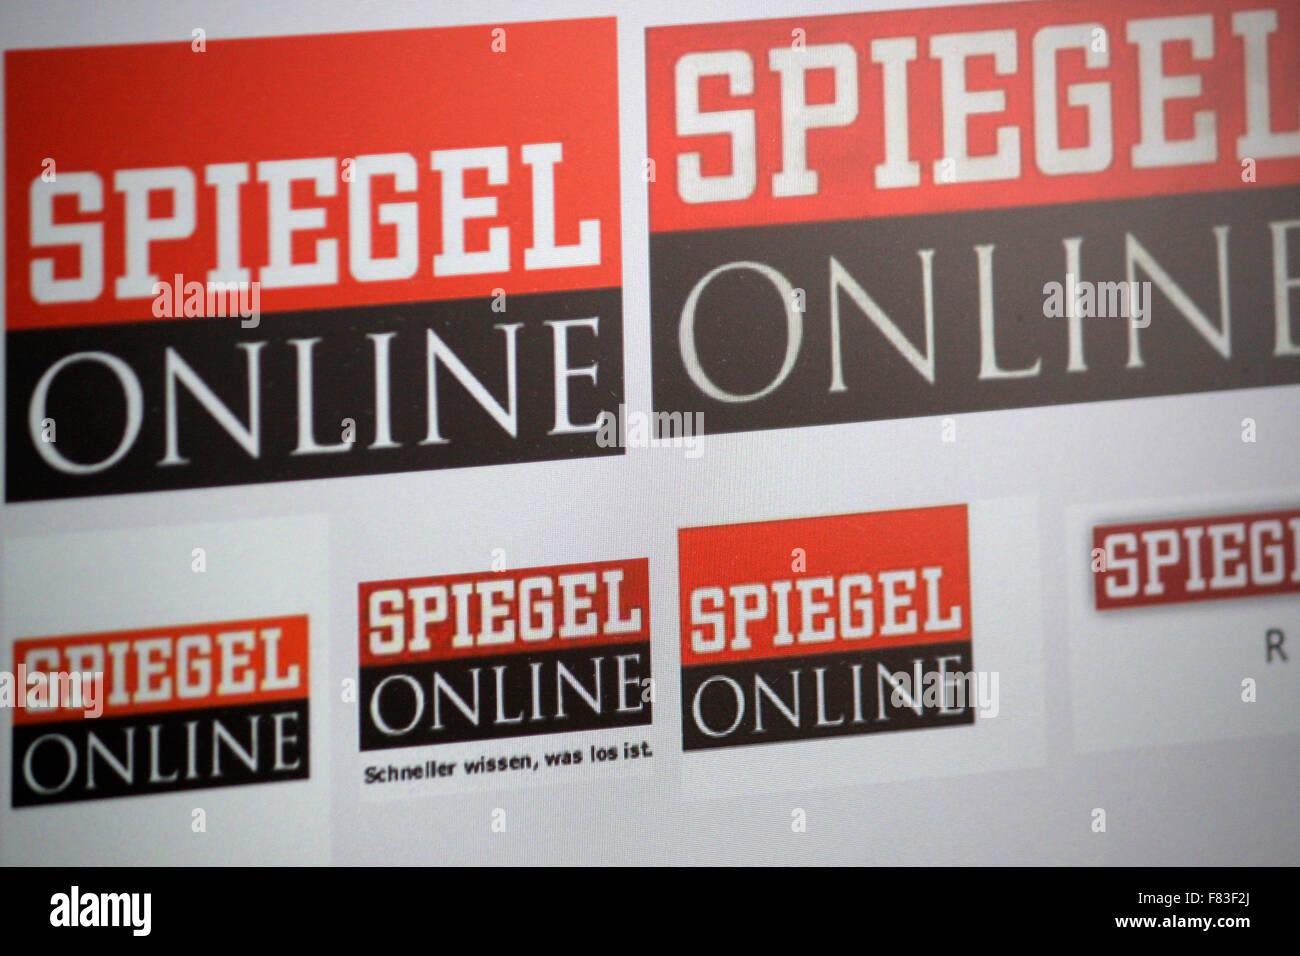 Markenname: 'Spiegel online' , Berlin. - Stock Image